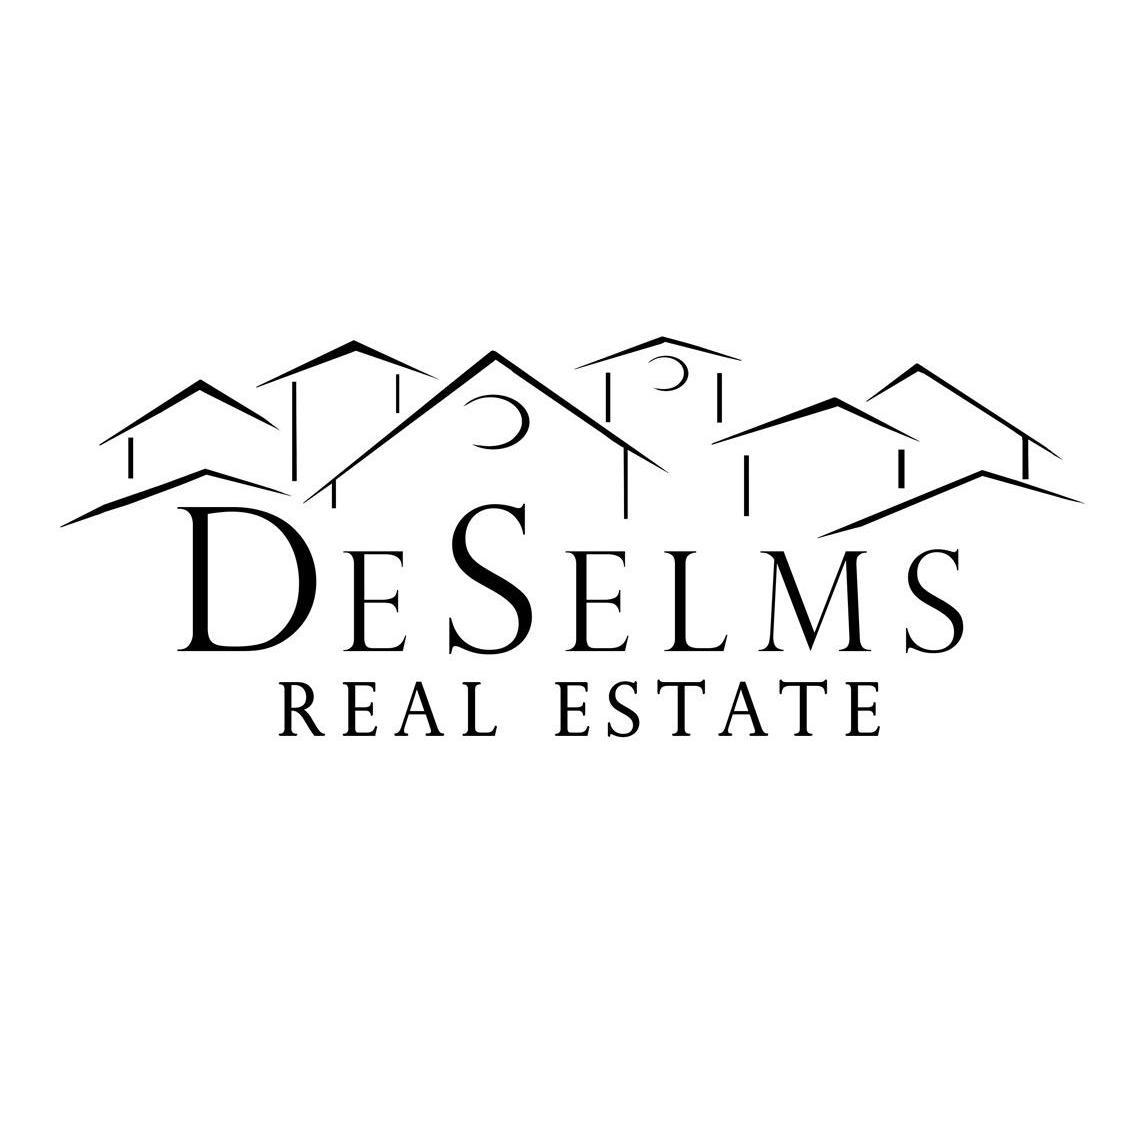 DeSelms Real Estate